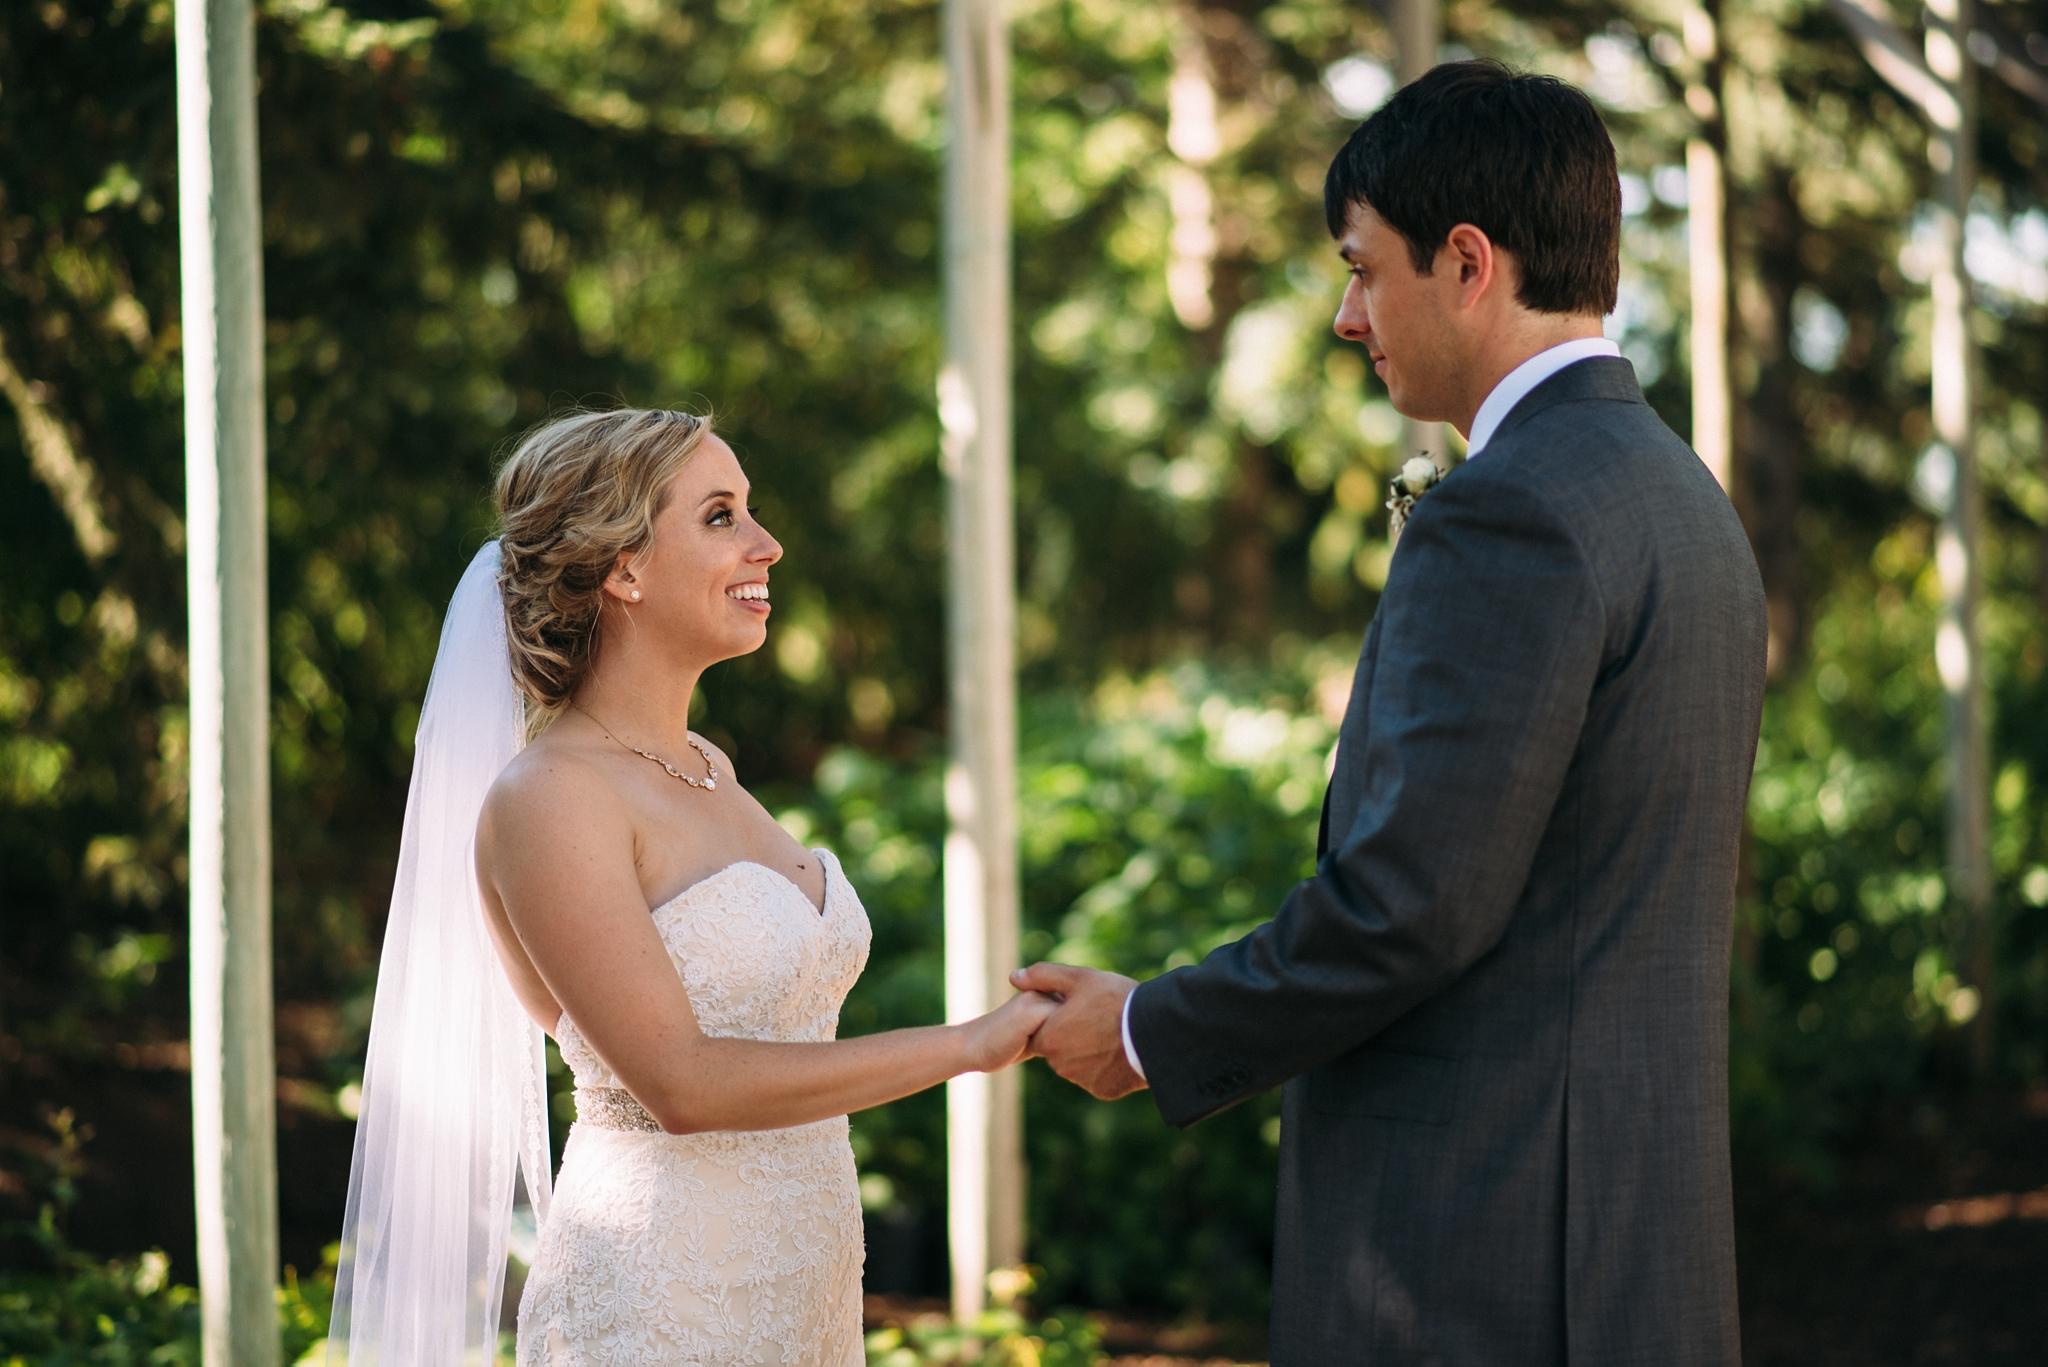 kaihla_tonai_intimate_wedding_elopement_photographer_4343